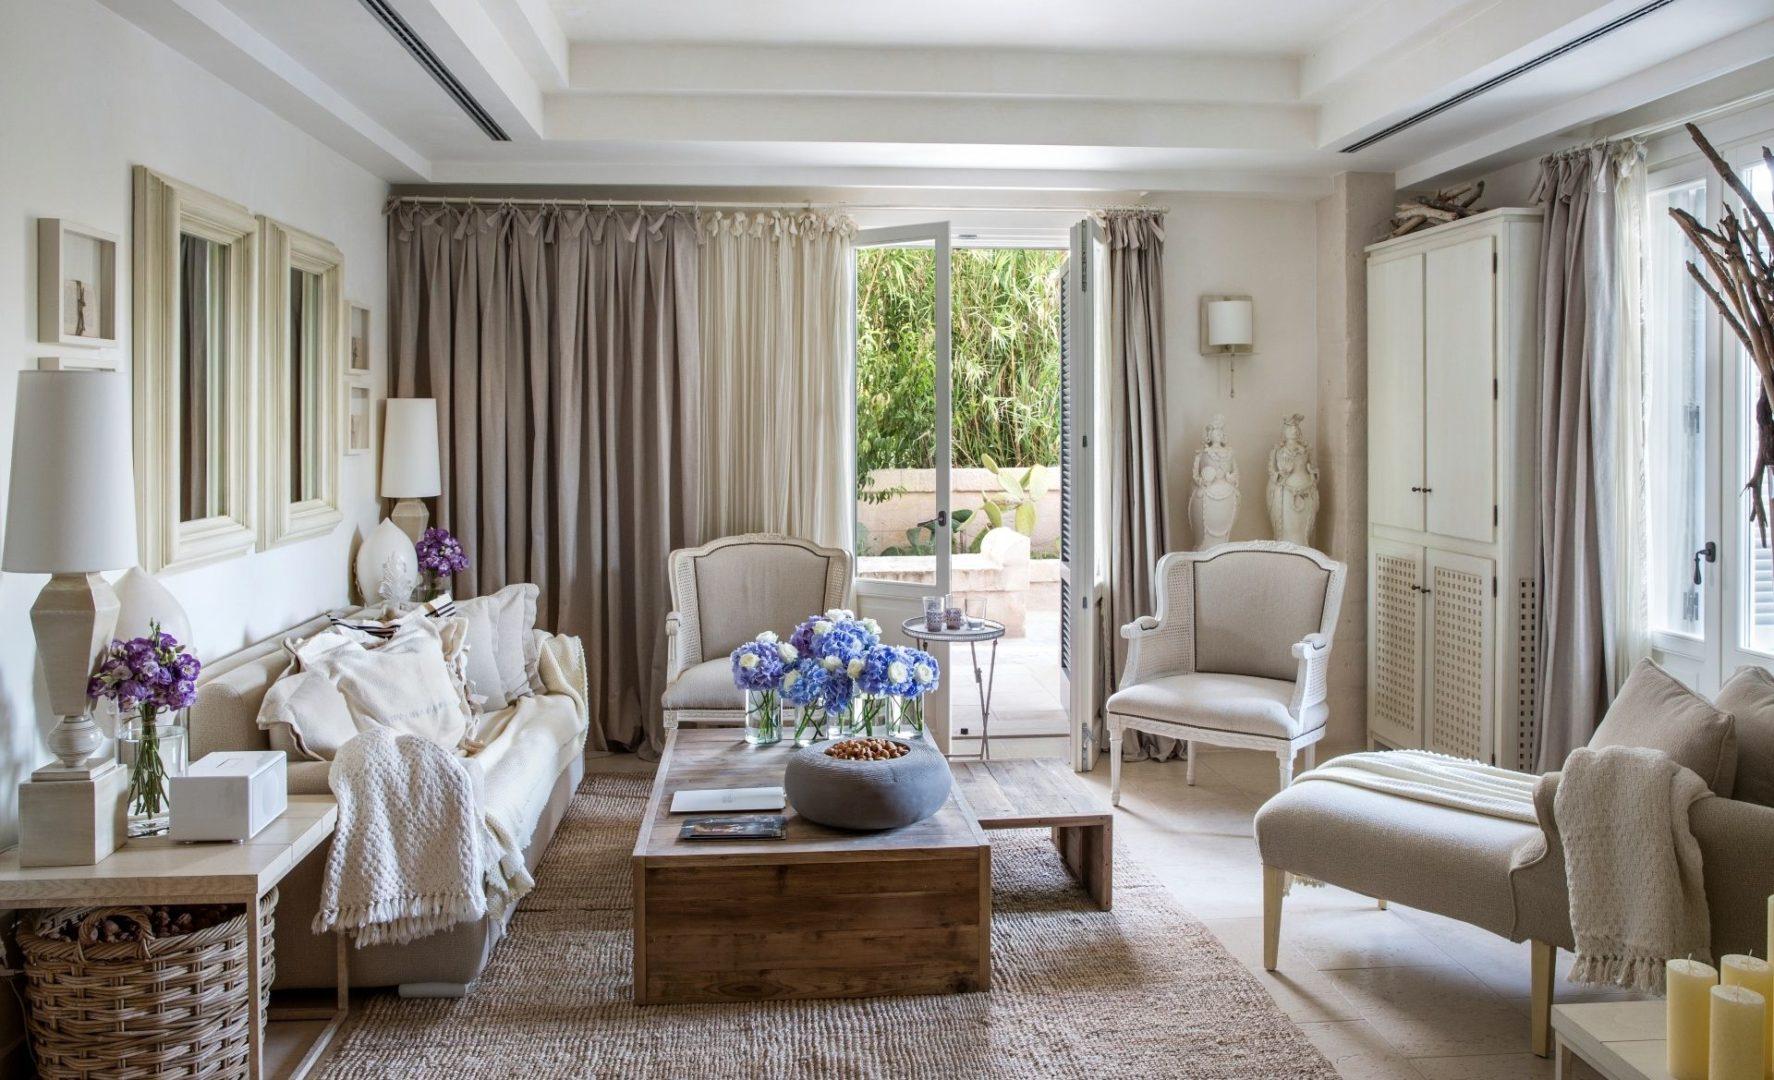 A Villa lounge